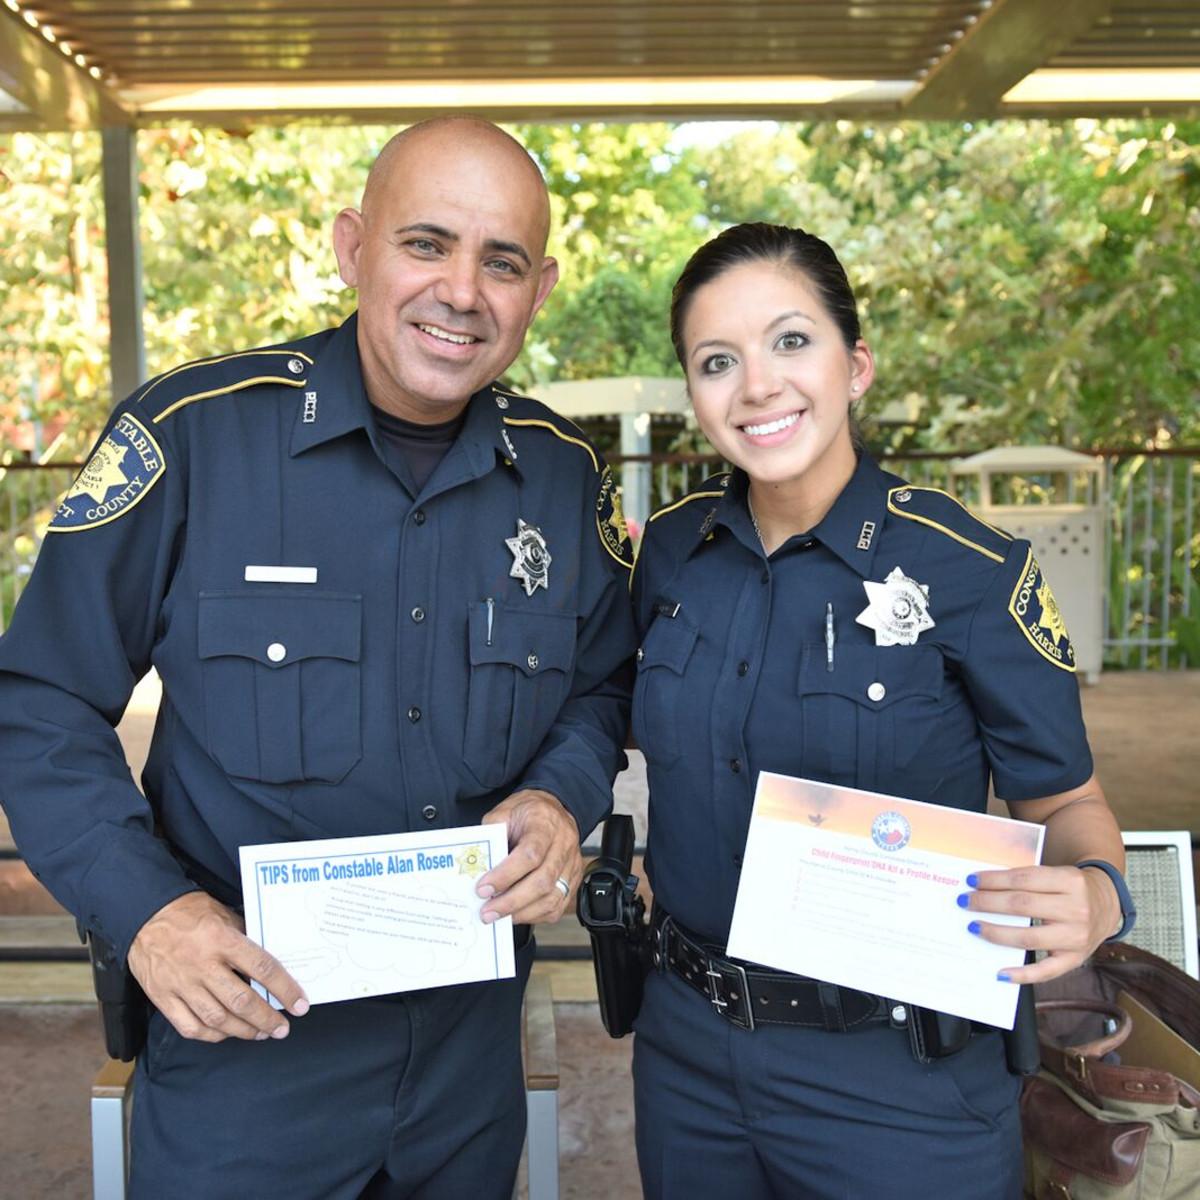 News, Shelby, Thread Alliance, Blue Moon Party, July 2015, Deputy Sam Olivares, Deputy Sandra Chavez